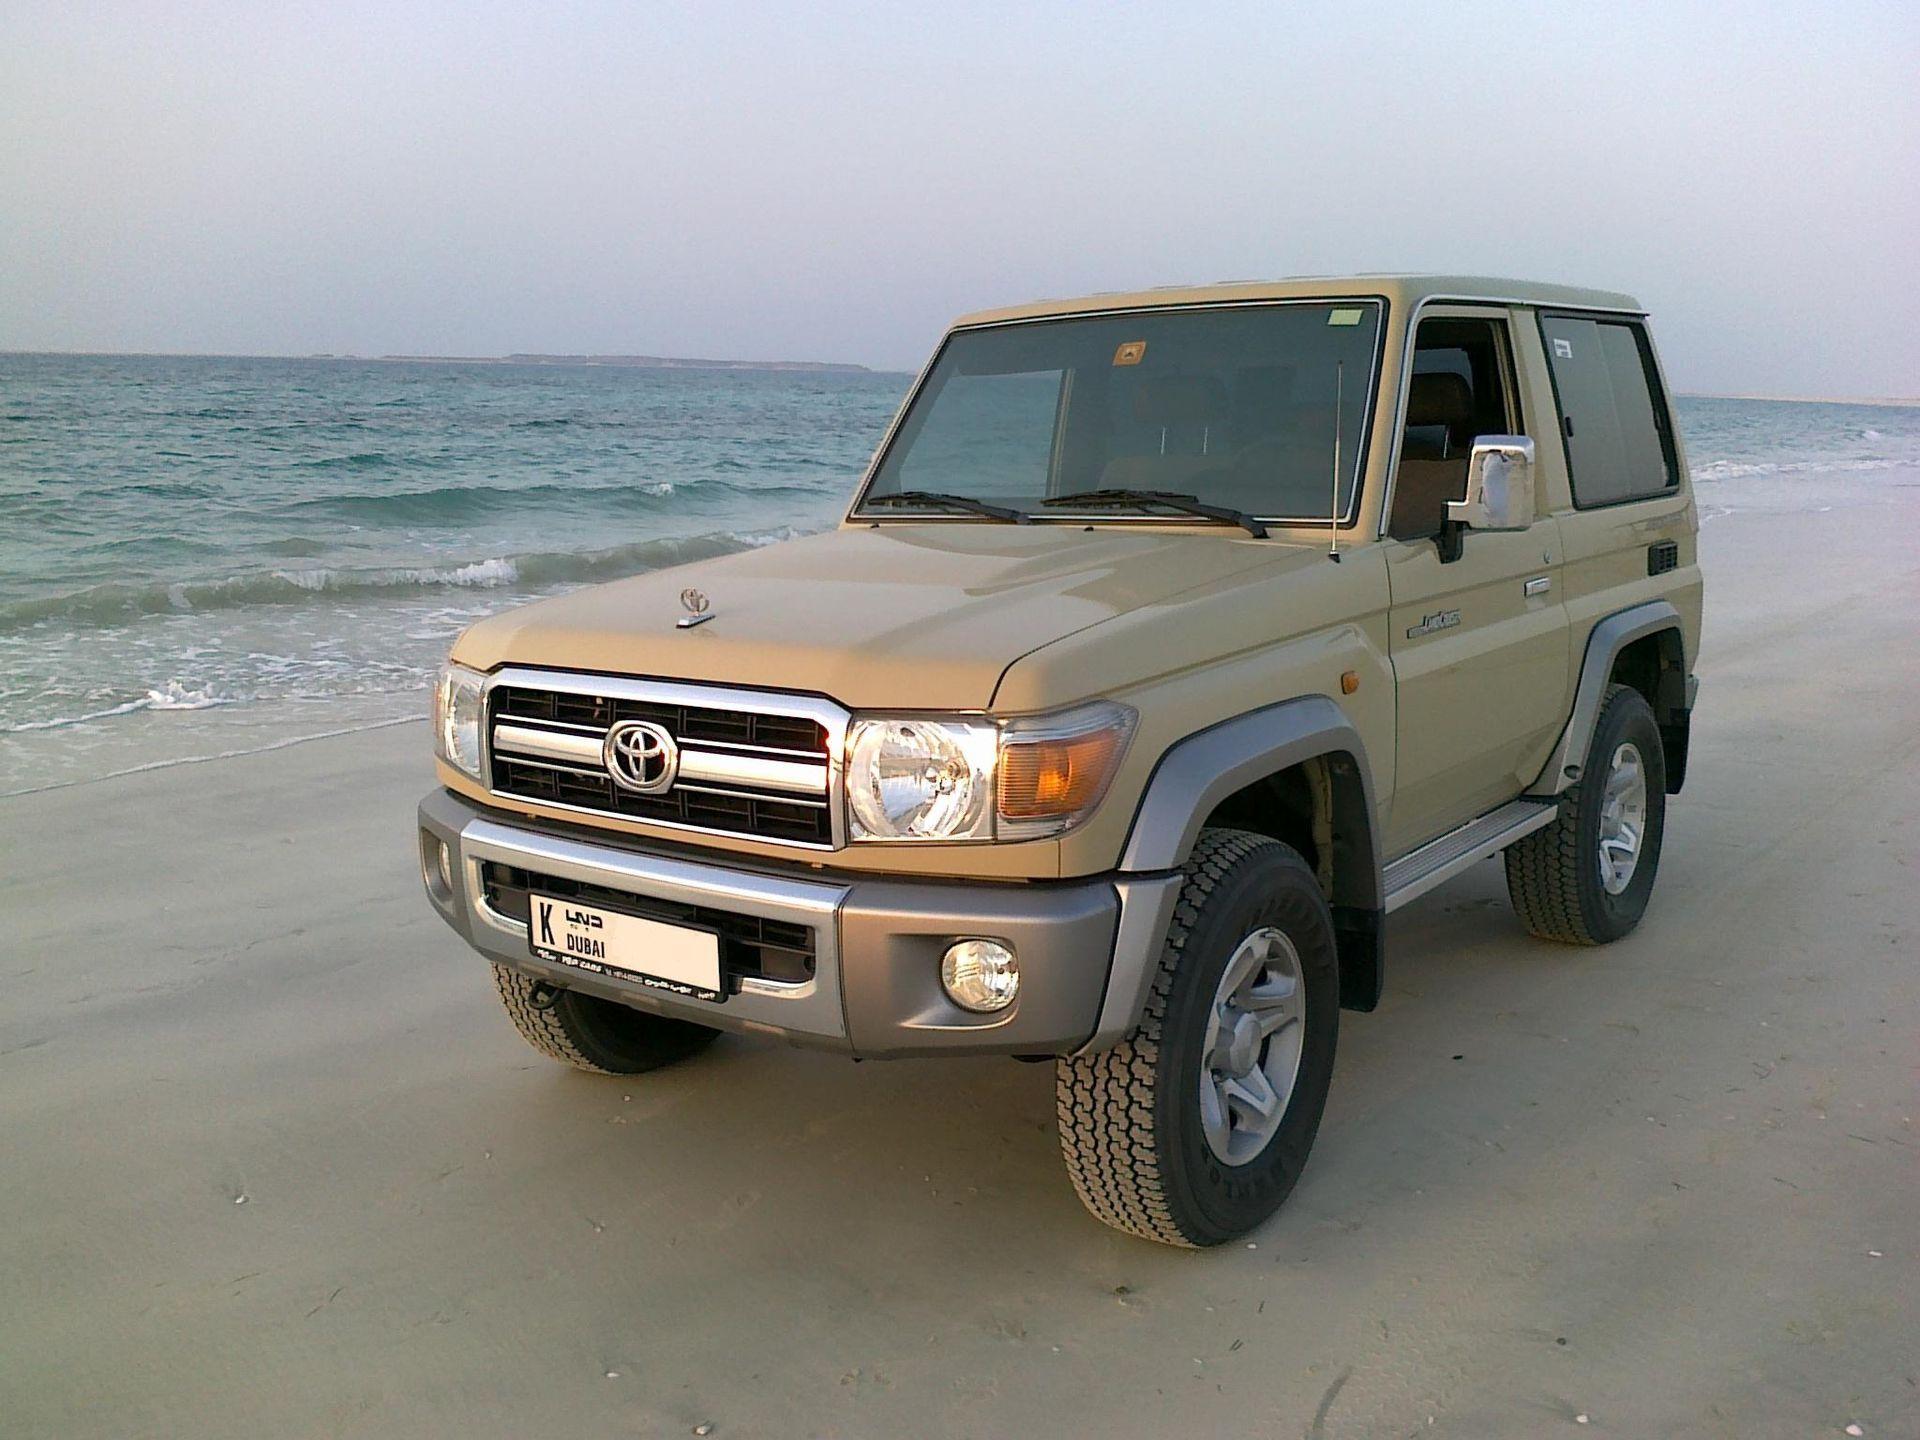 Kelebihan Kekurangan Toyota Land Cruiser 2009 Harga